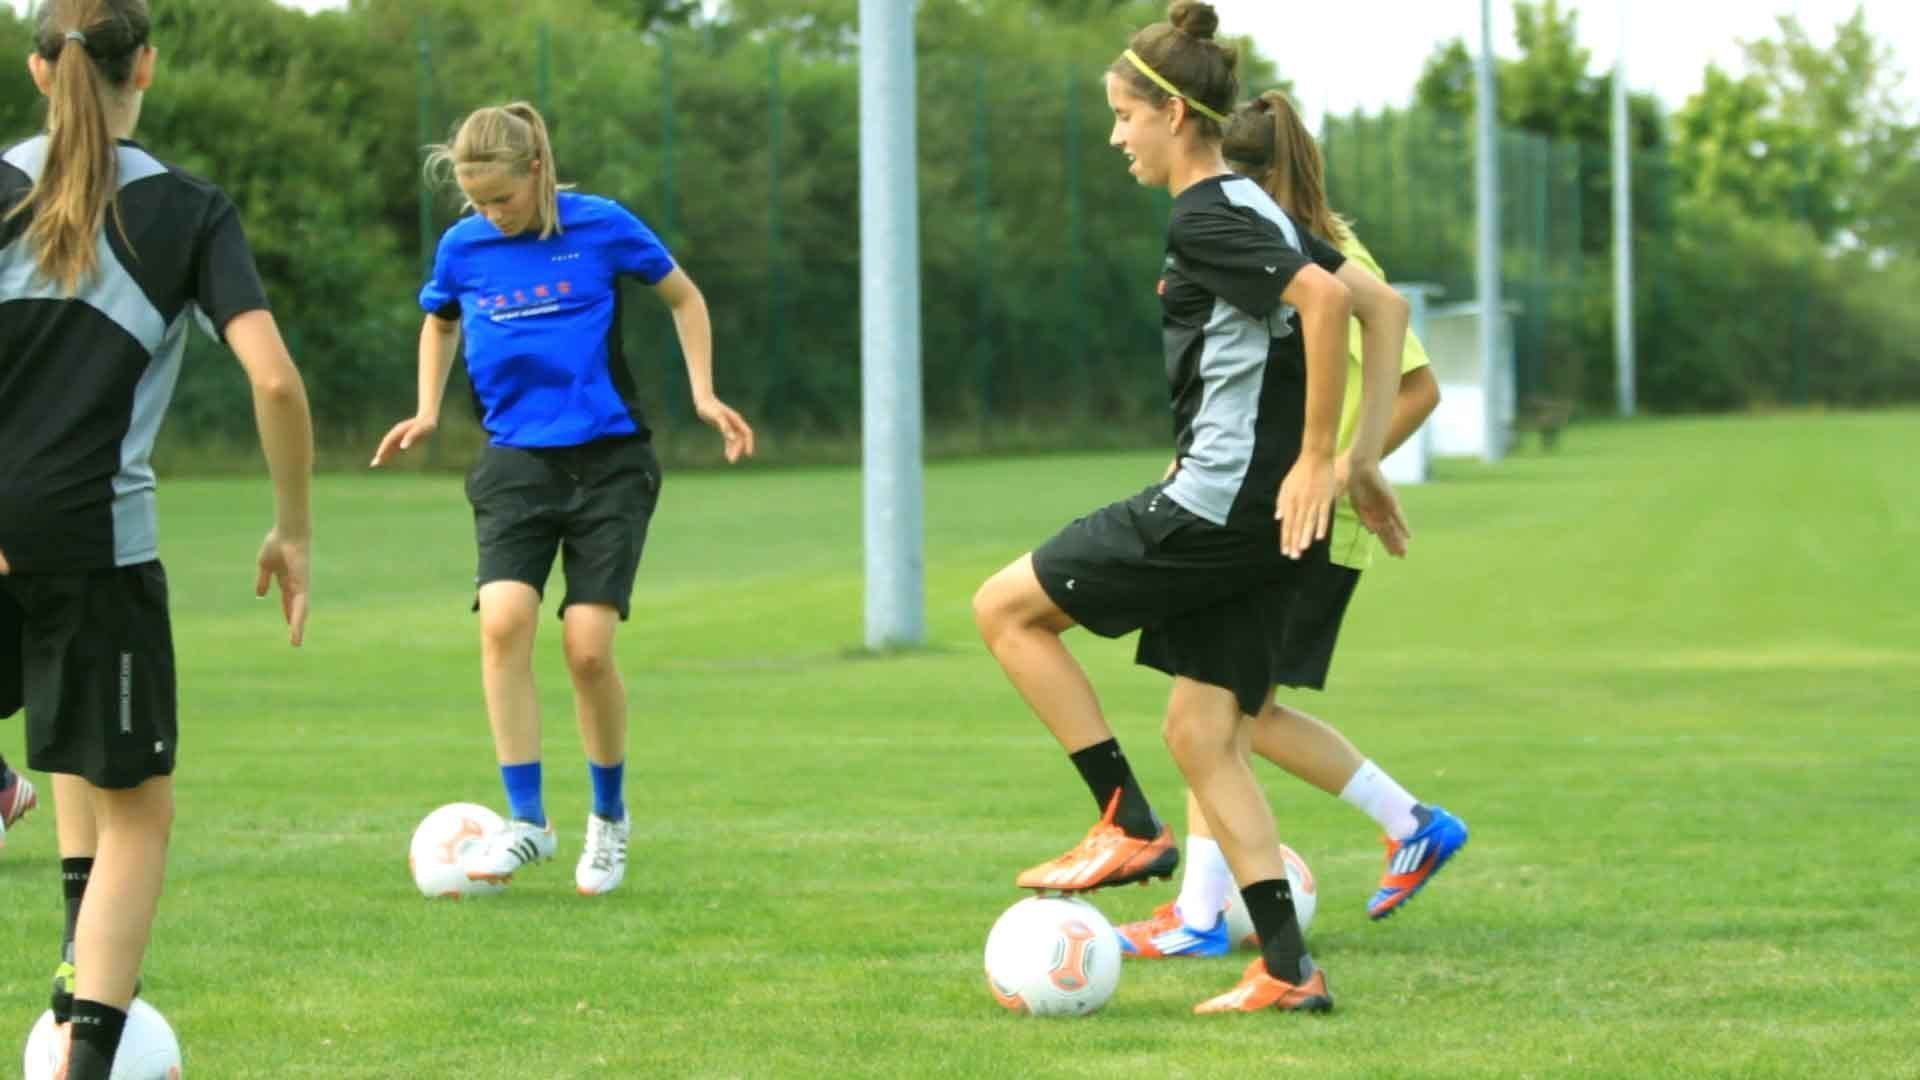 Fußballtricks: Schere mit Tippbewegung – Bewegungsmuster 3